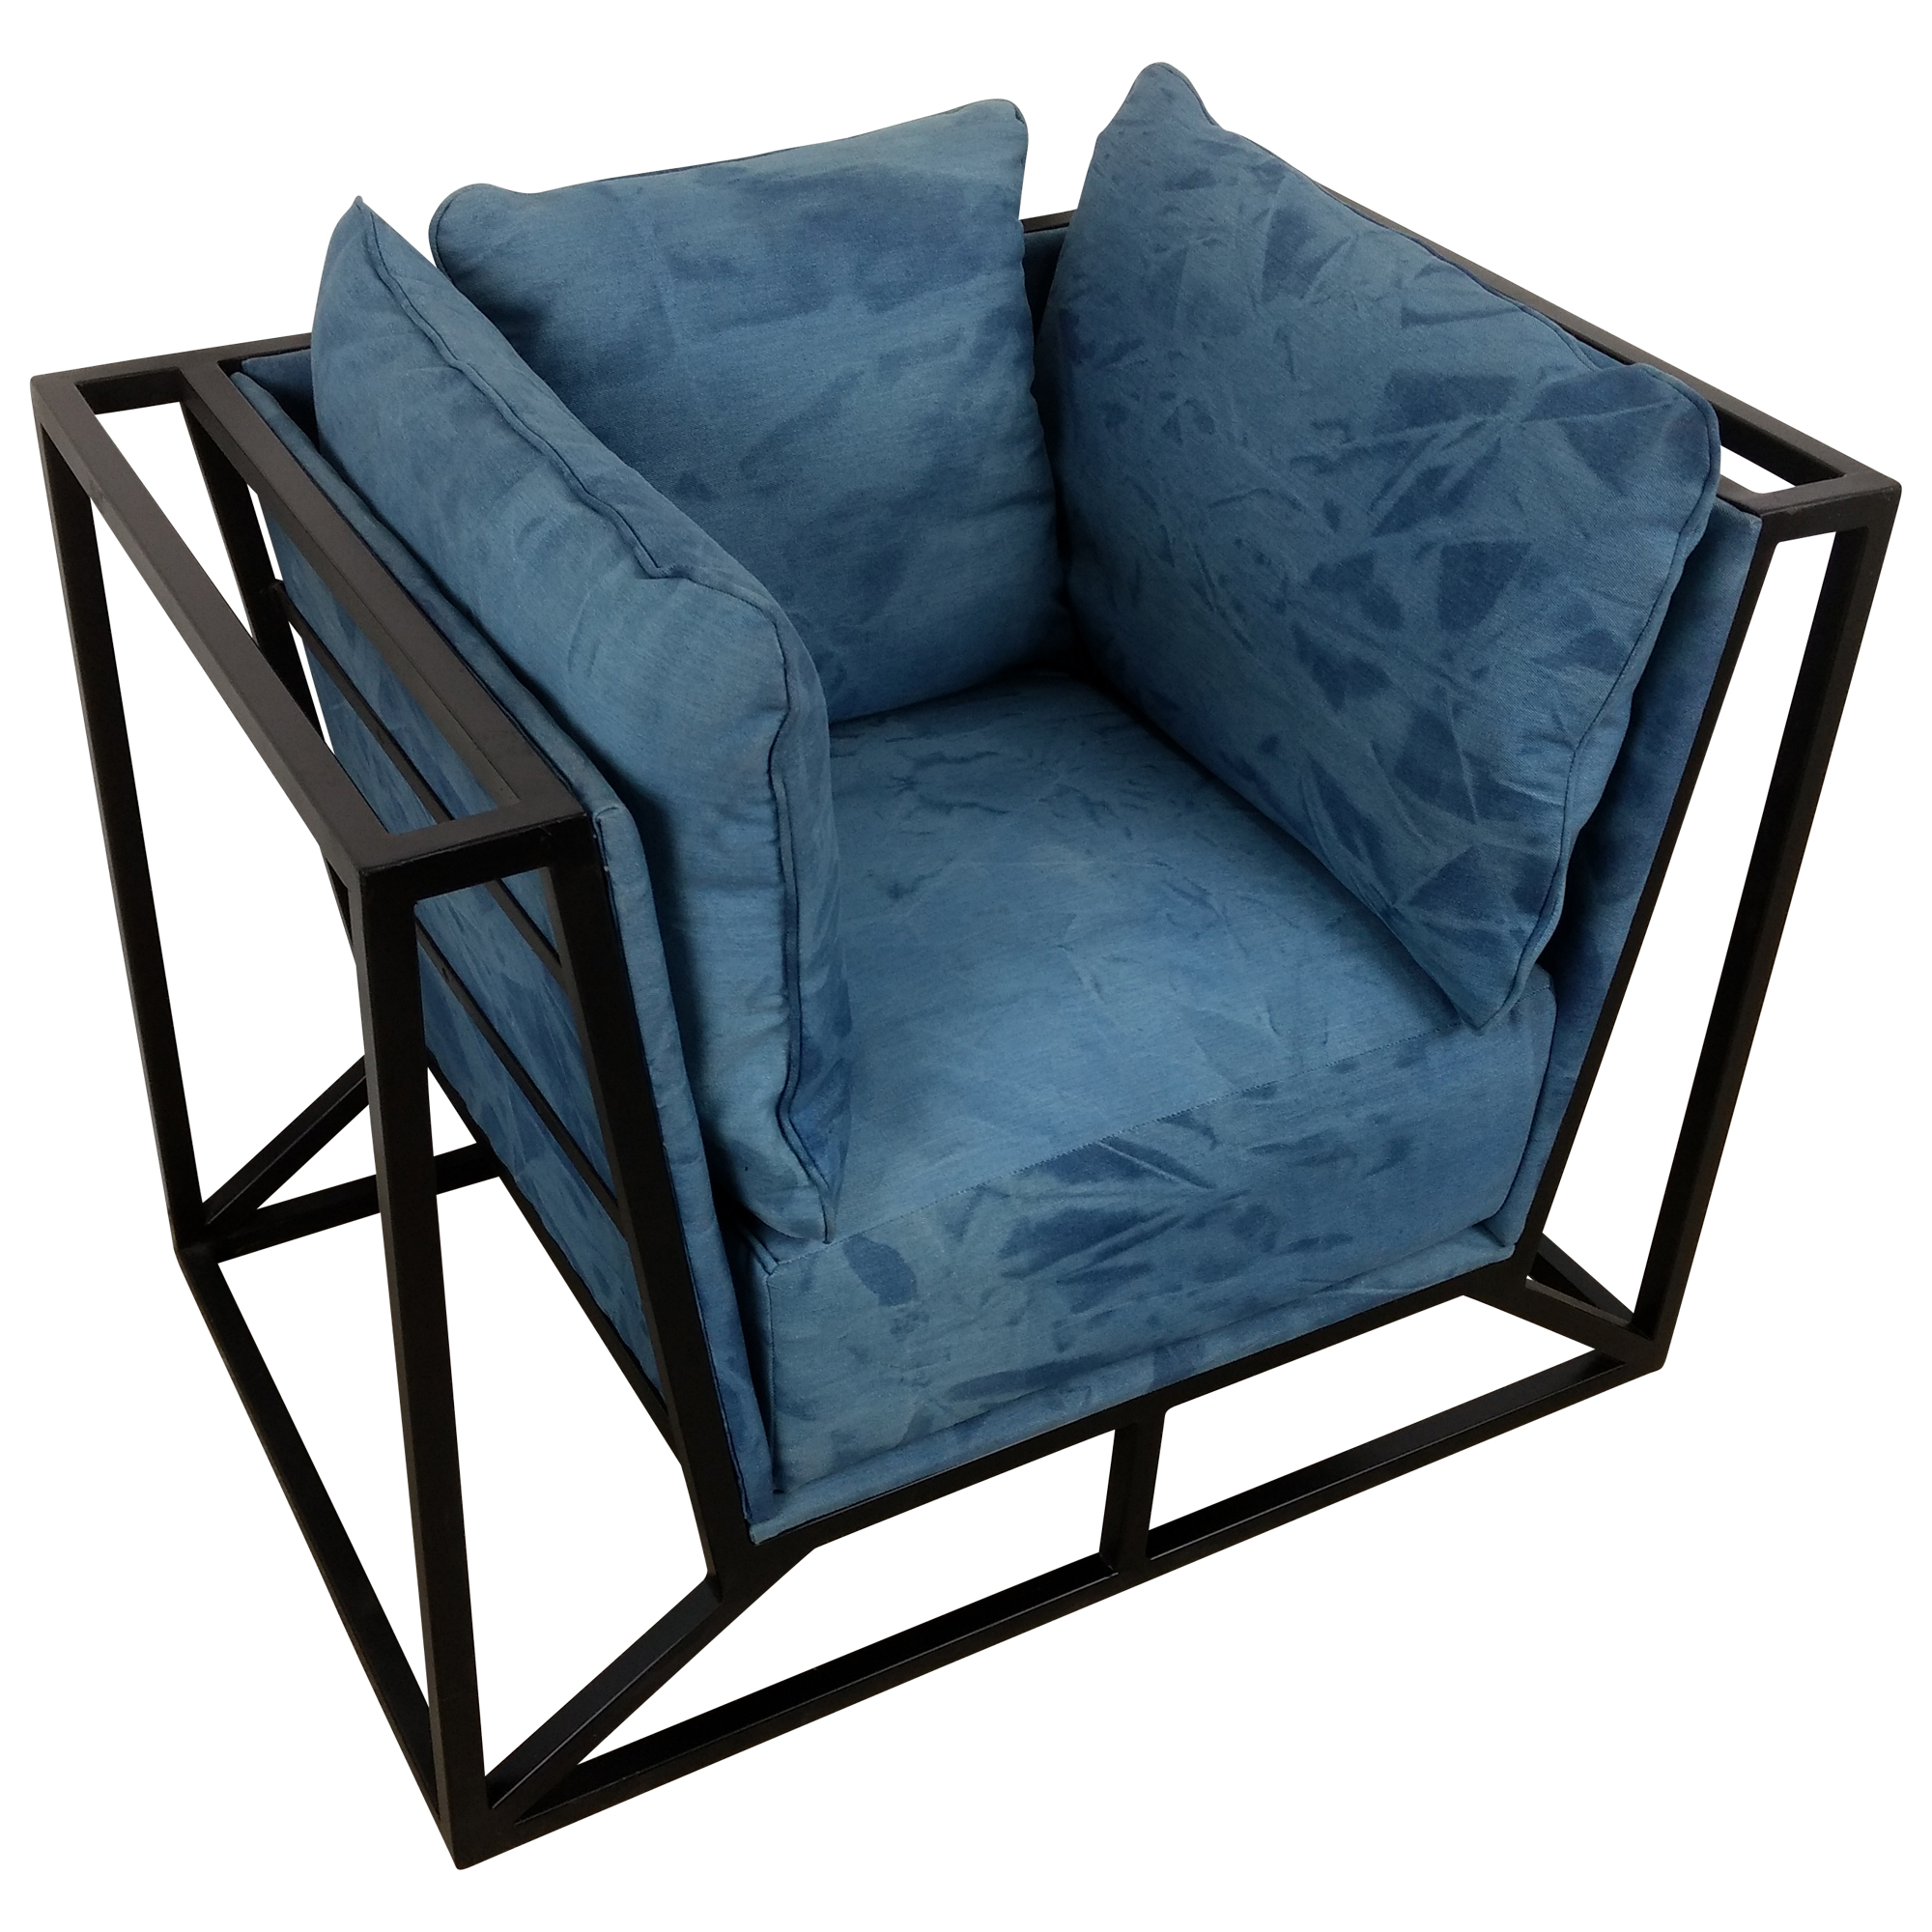 Delicieux Vorschau: Sessel Clubsessel Lounge Relaxsessel CANVA Designer Armcair Loft  Industrie Jeans ...